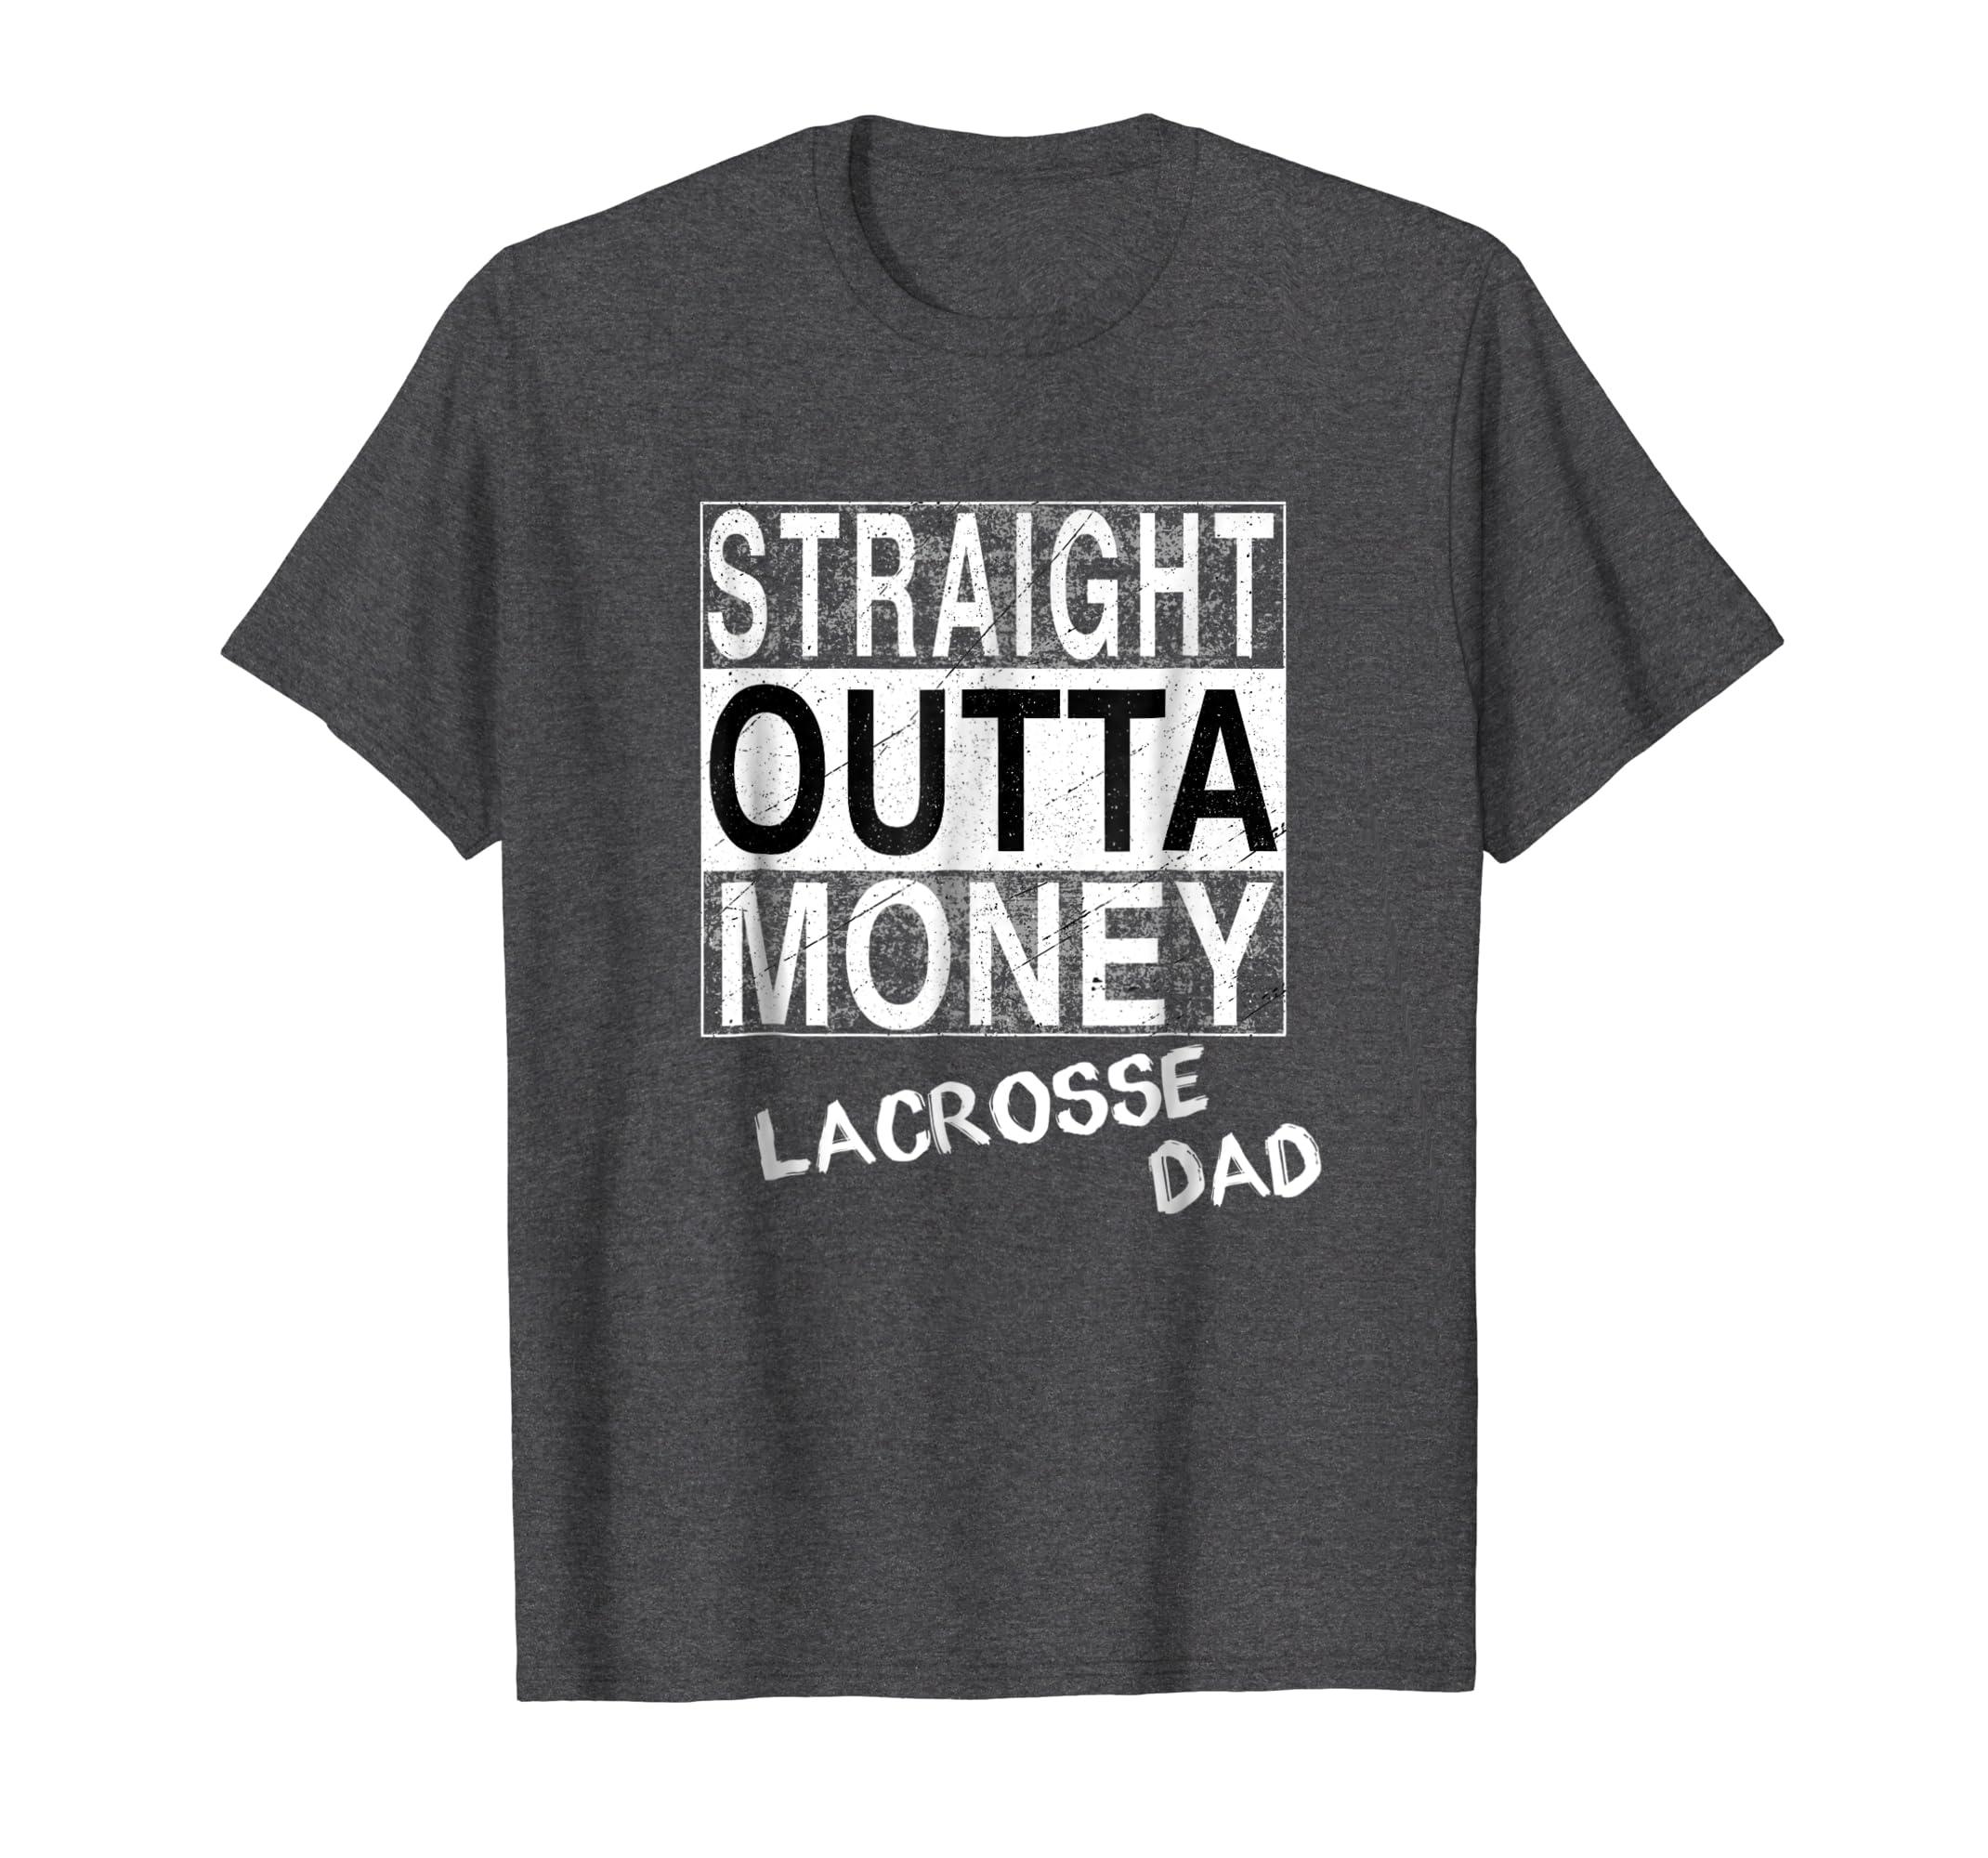 e170f1e0 Amazon.com: Mens Straight Outta Money Lacrosse Dad Funny T-Shirt: Clothing